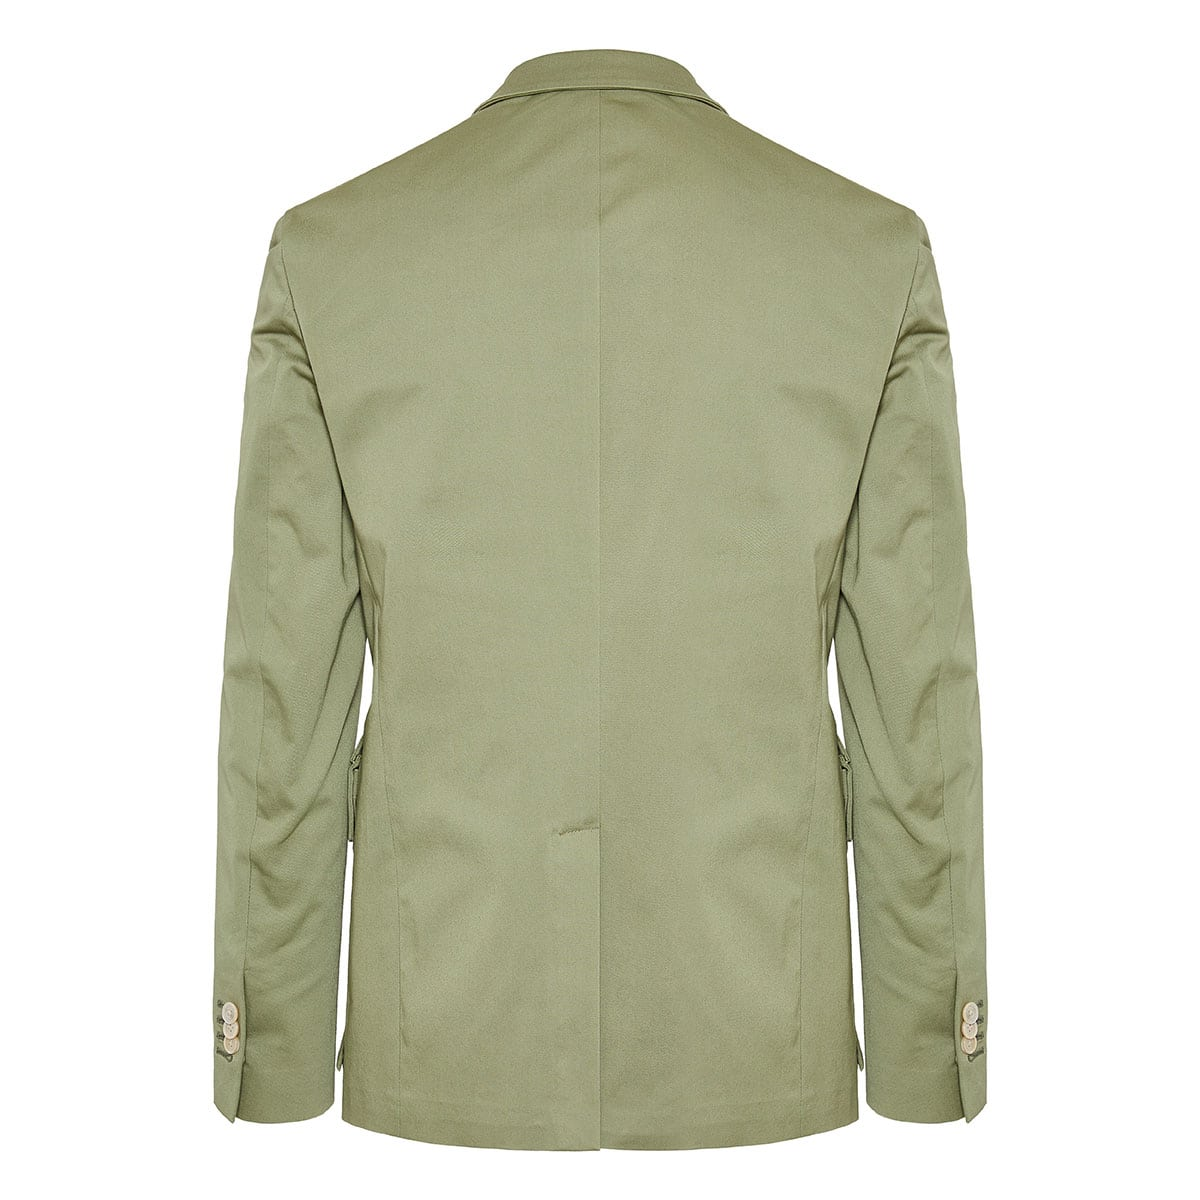 Blazer with detachable pockets